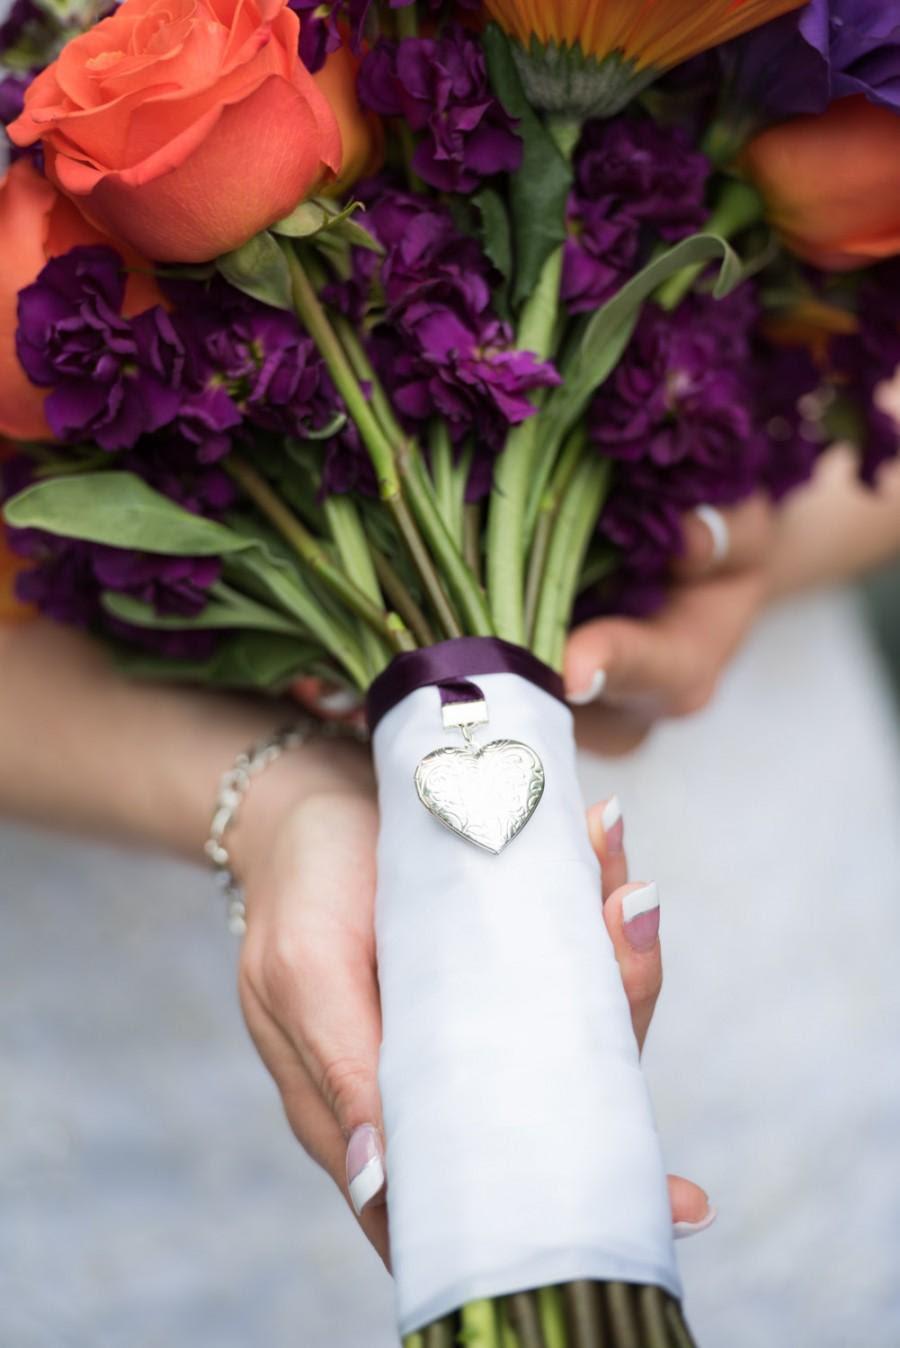 Wedding Bouquet Heart Locket Memory Photo Frame Bridal Charm Bride